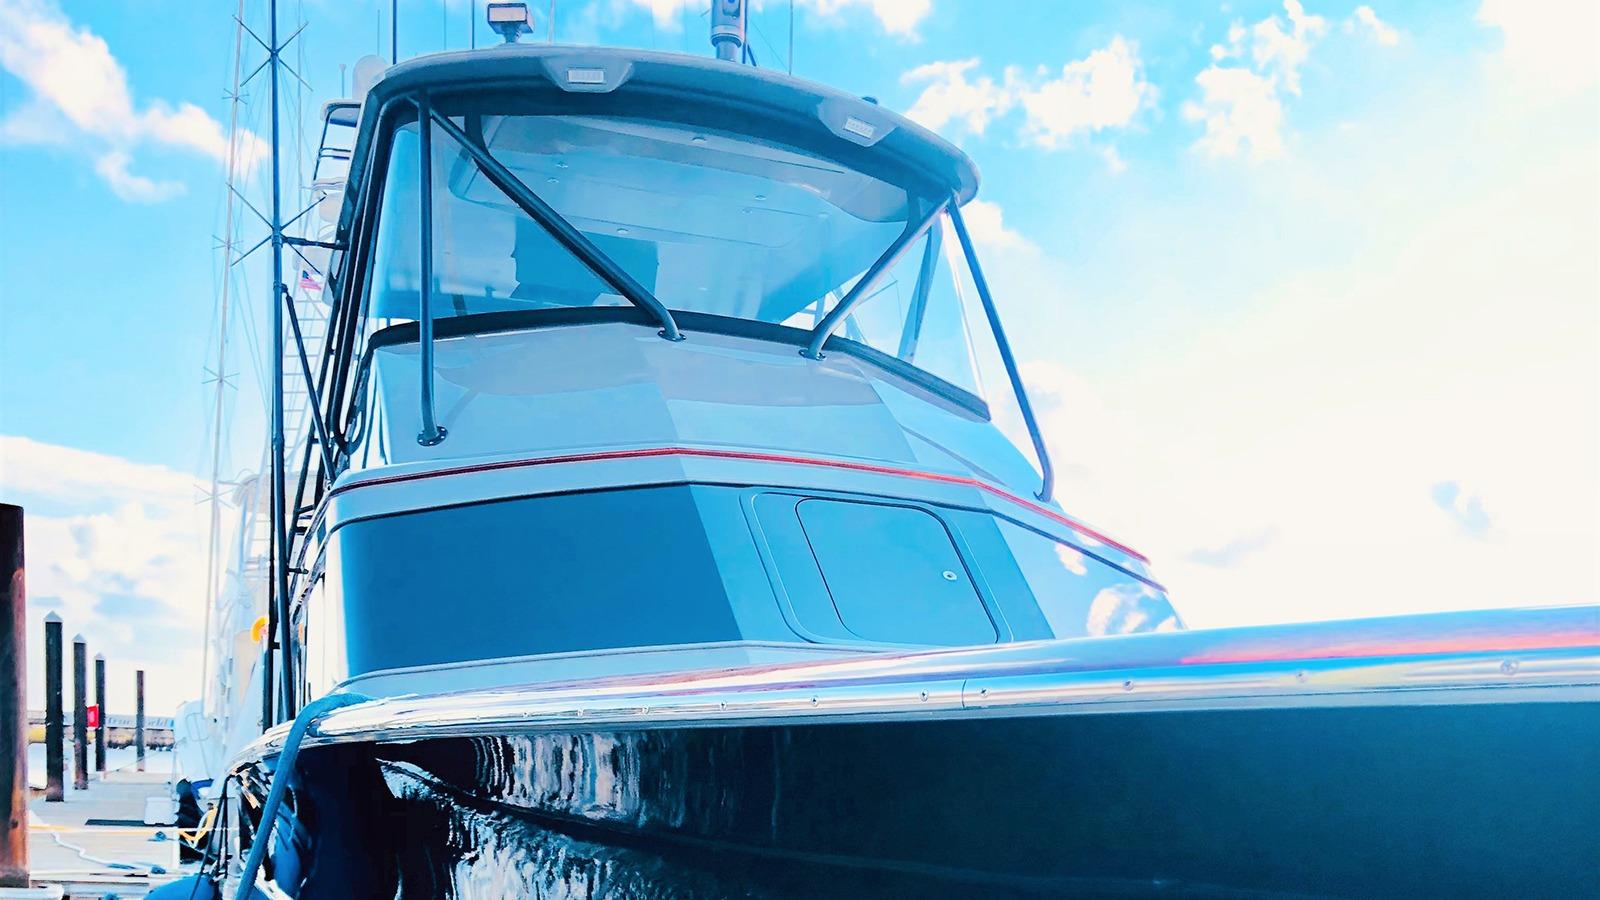 Indigo Outside Boat SHot